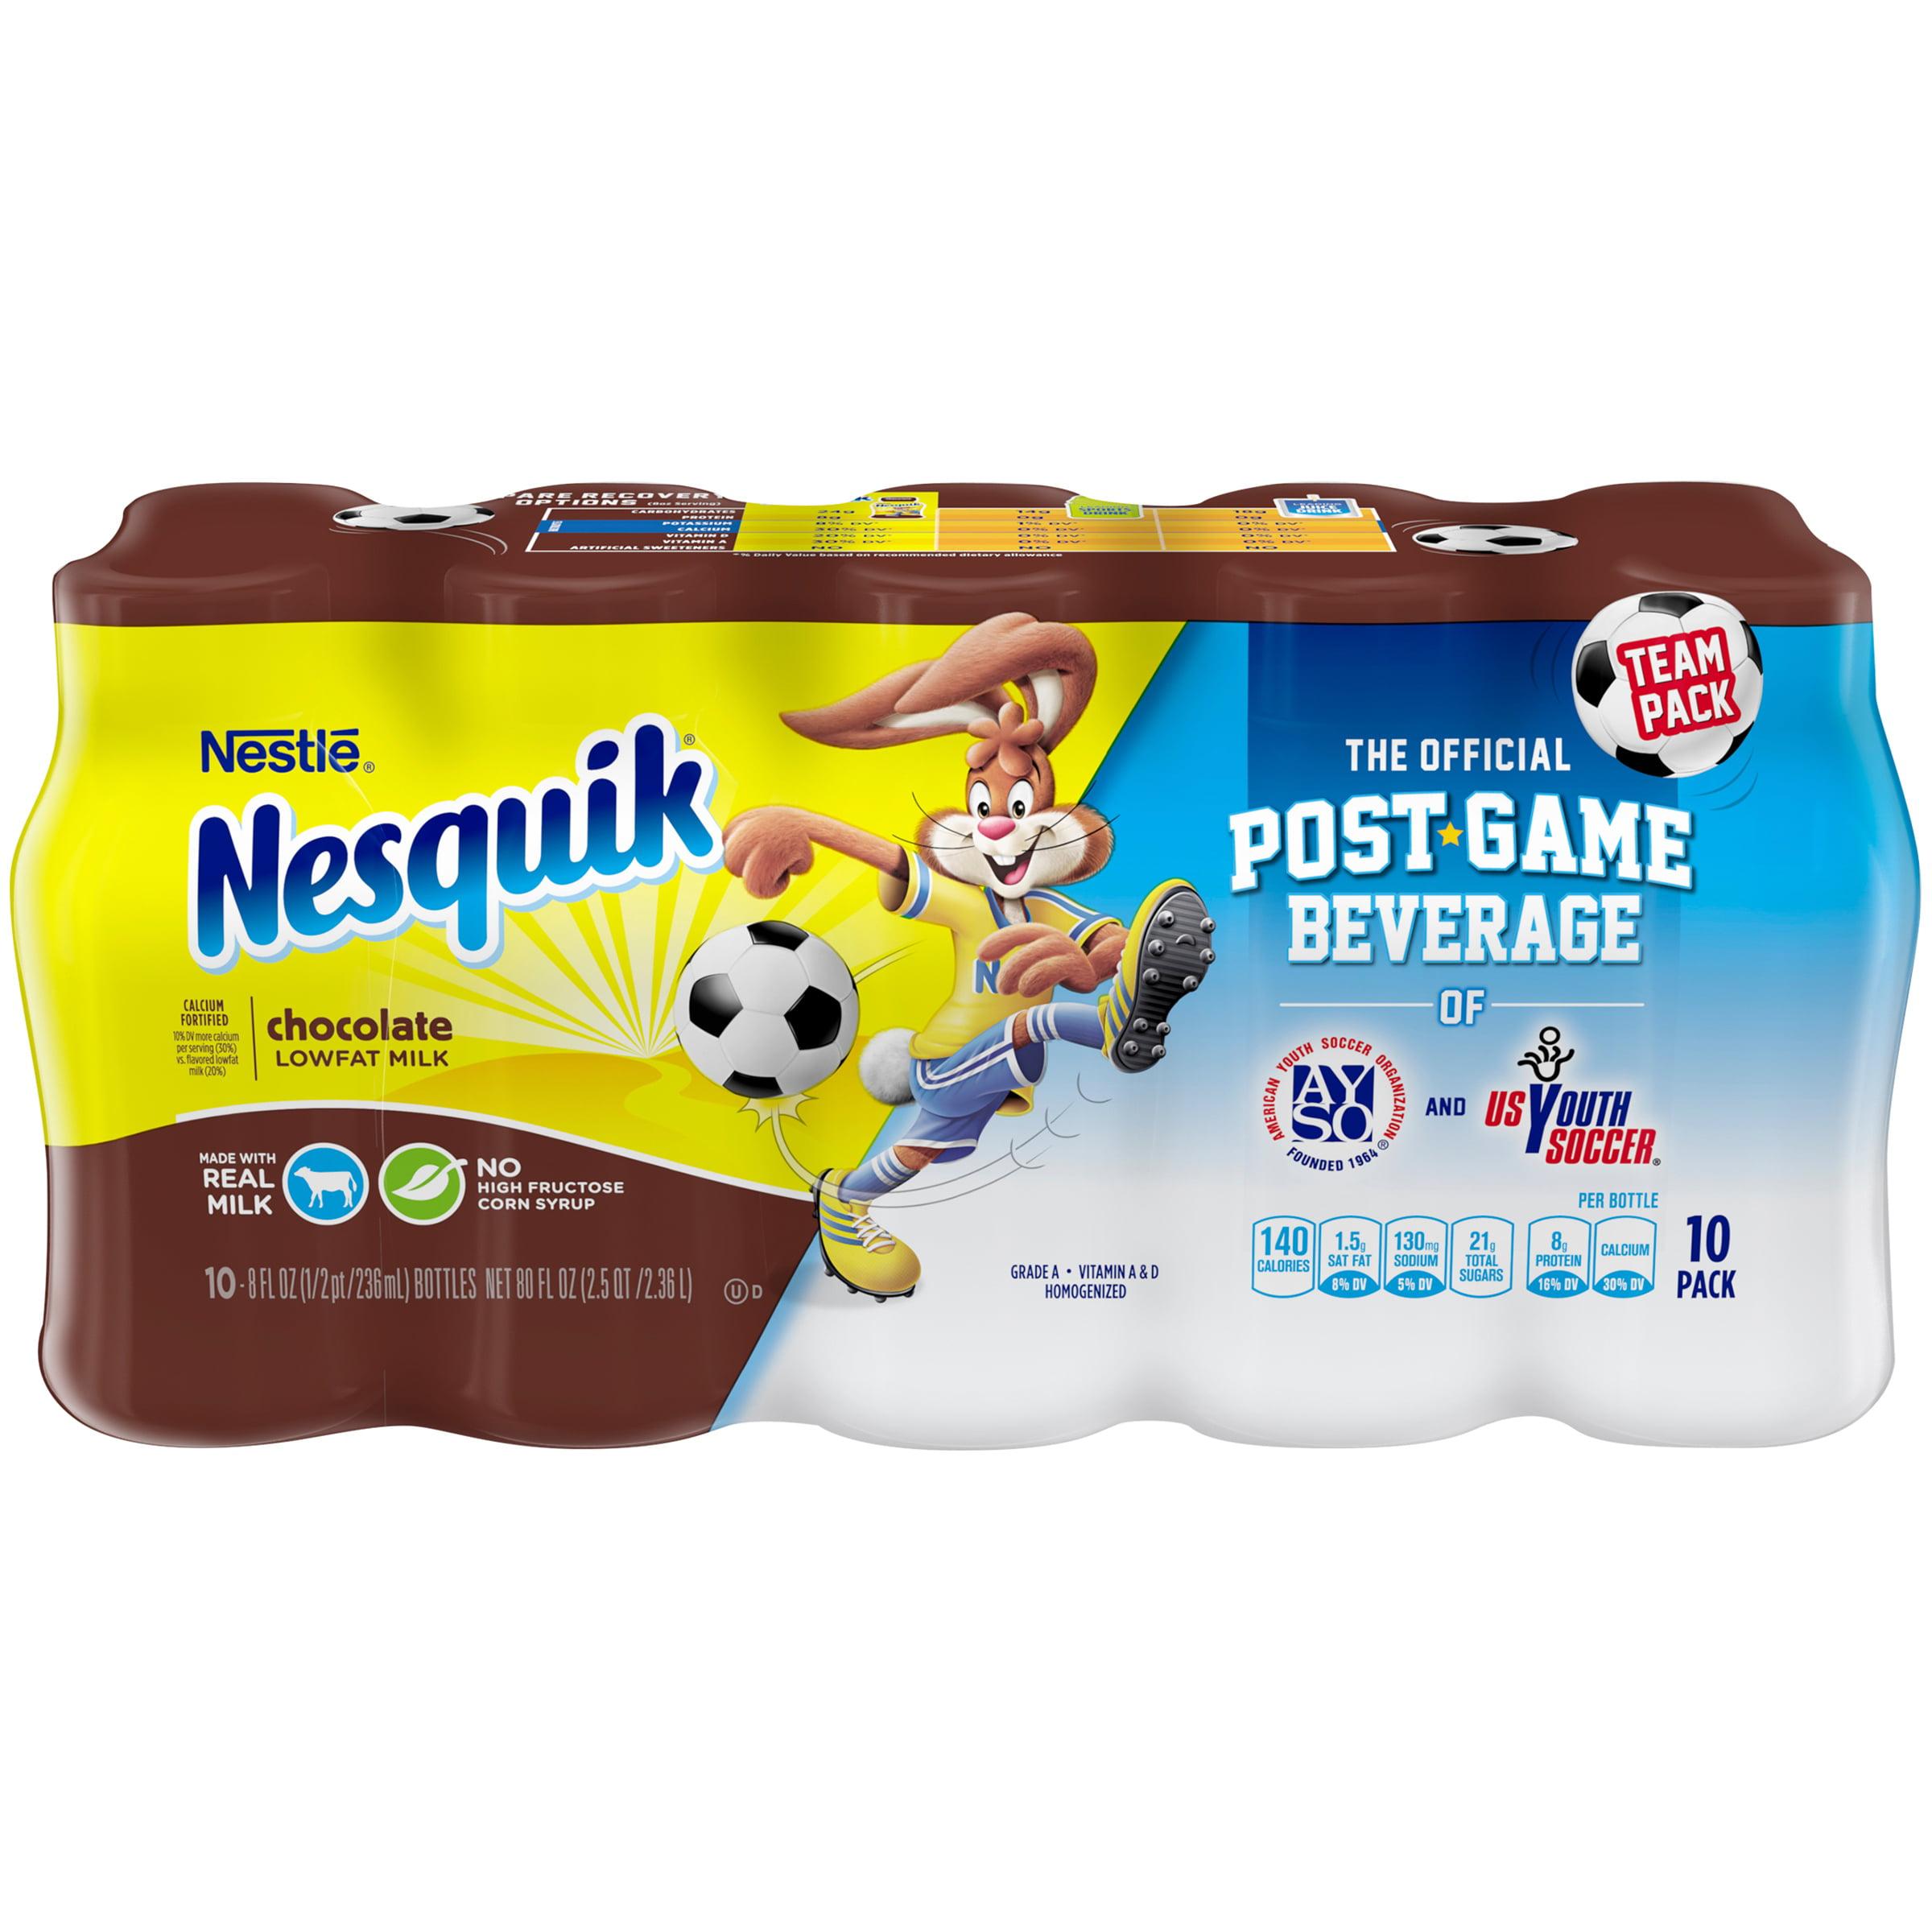 NESTLE NESQUIK Chocolate Flavored Low Fat Milk 10-8 fl. oz ...